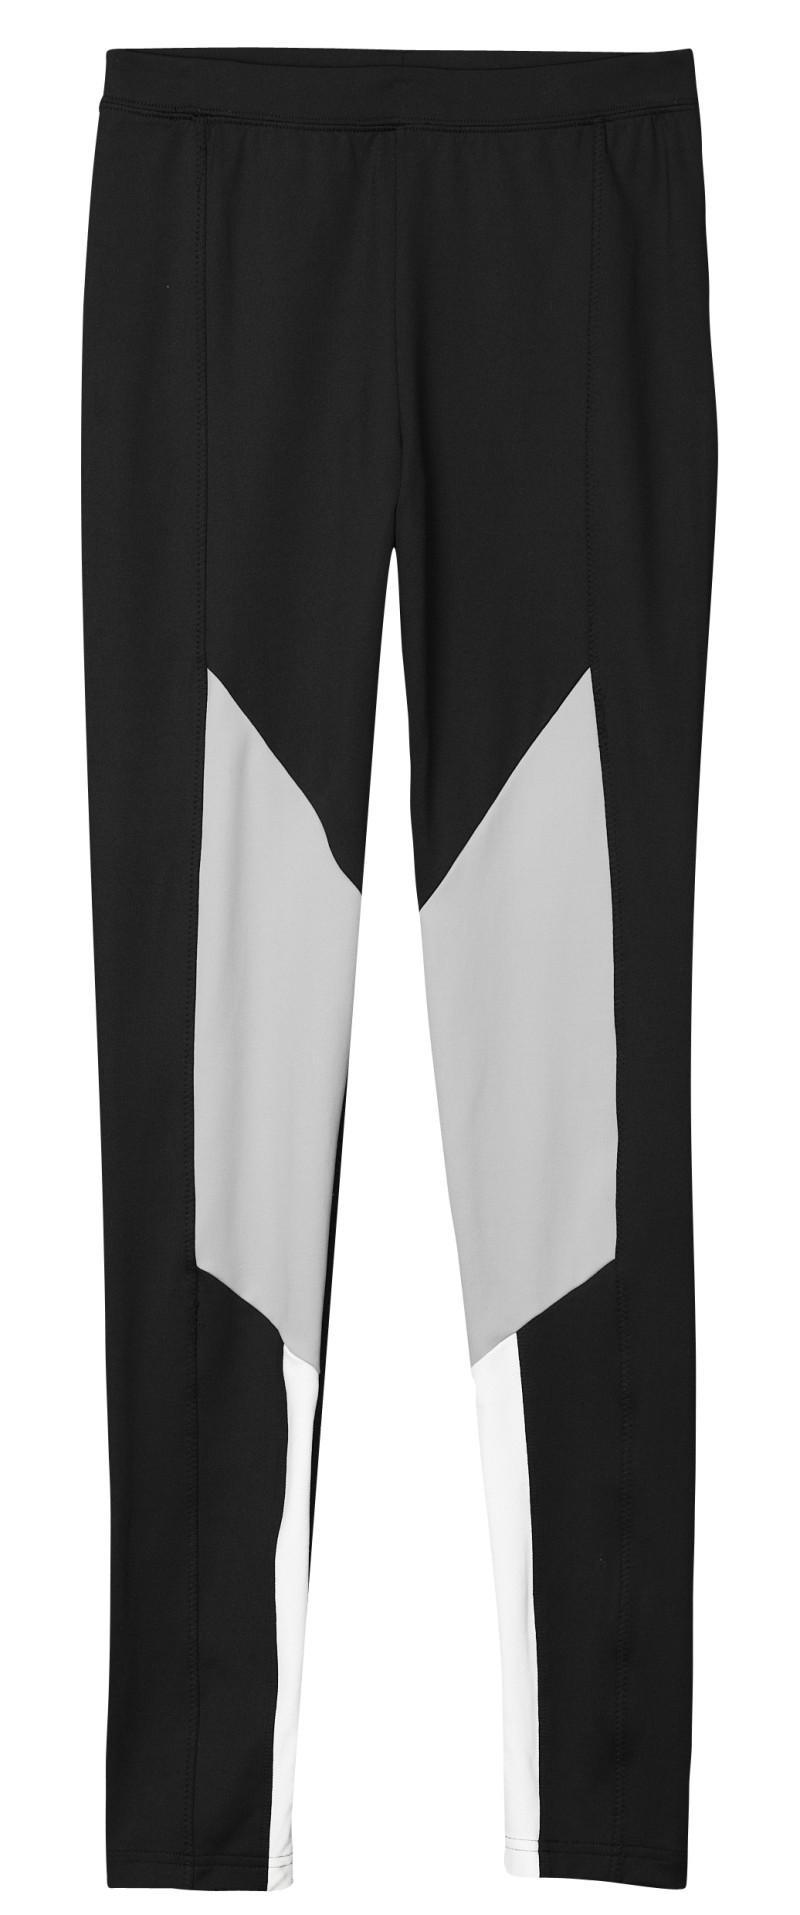 czarne legginsy H&M - kolekcja wiosenna